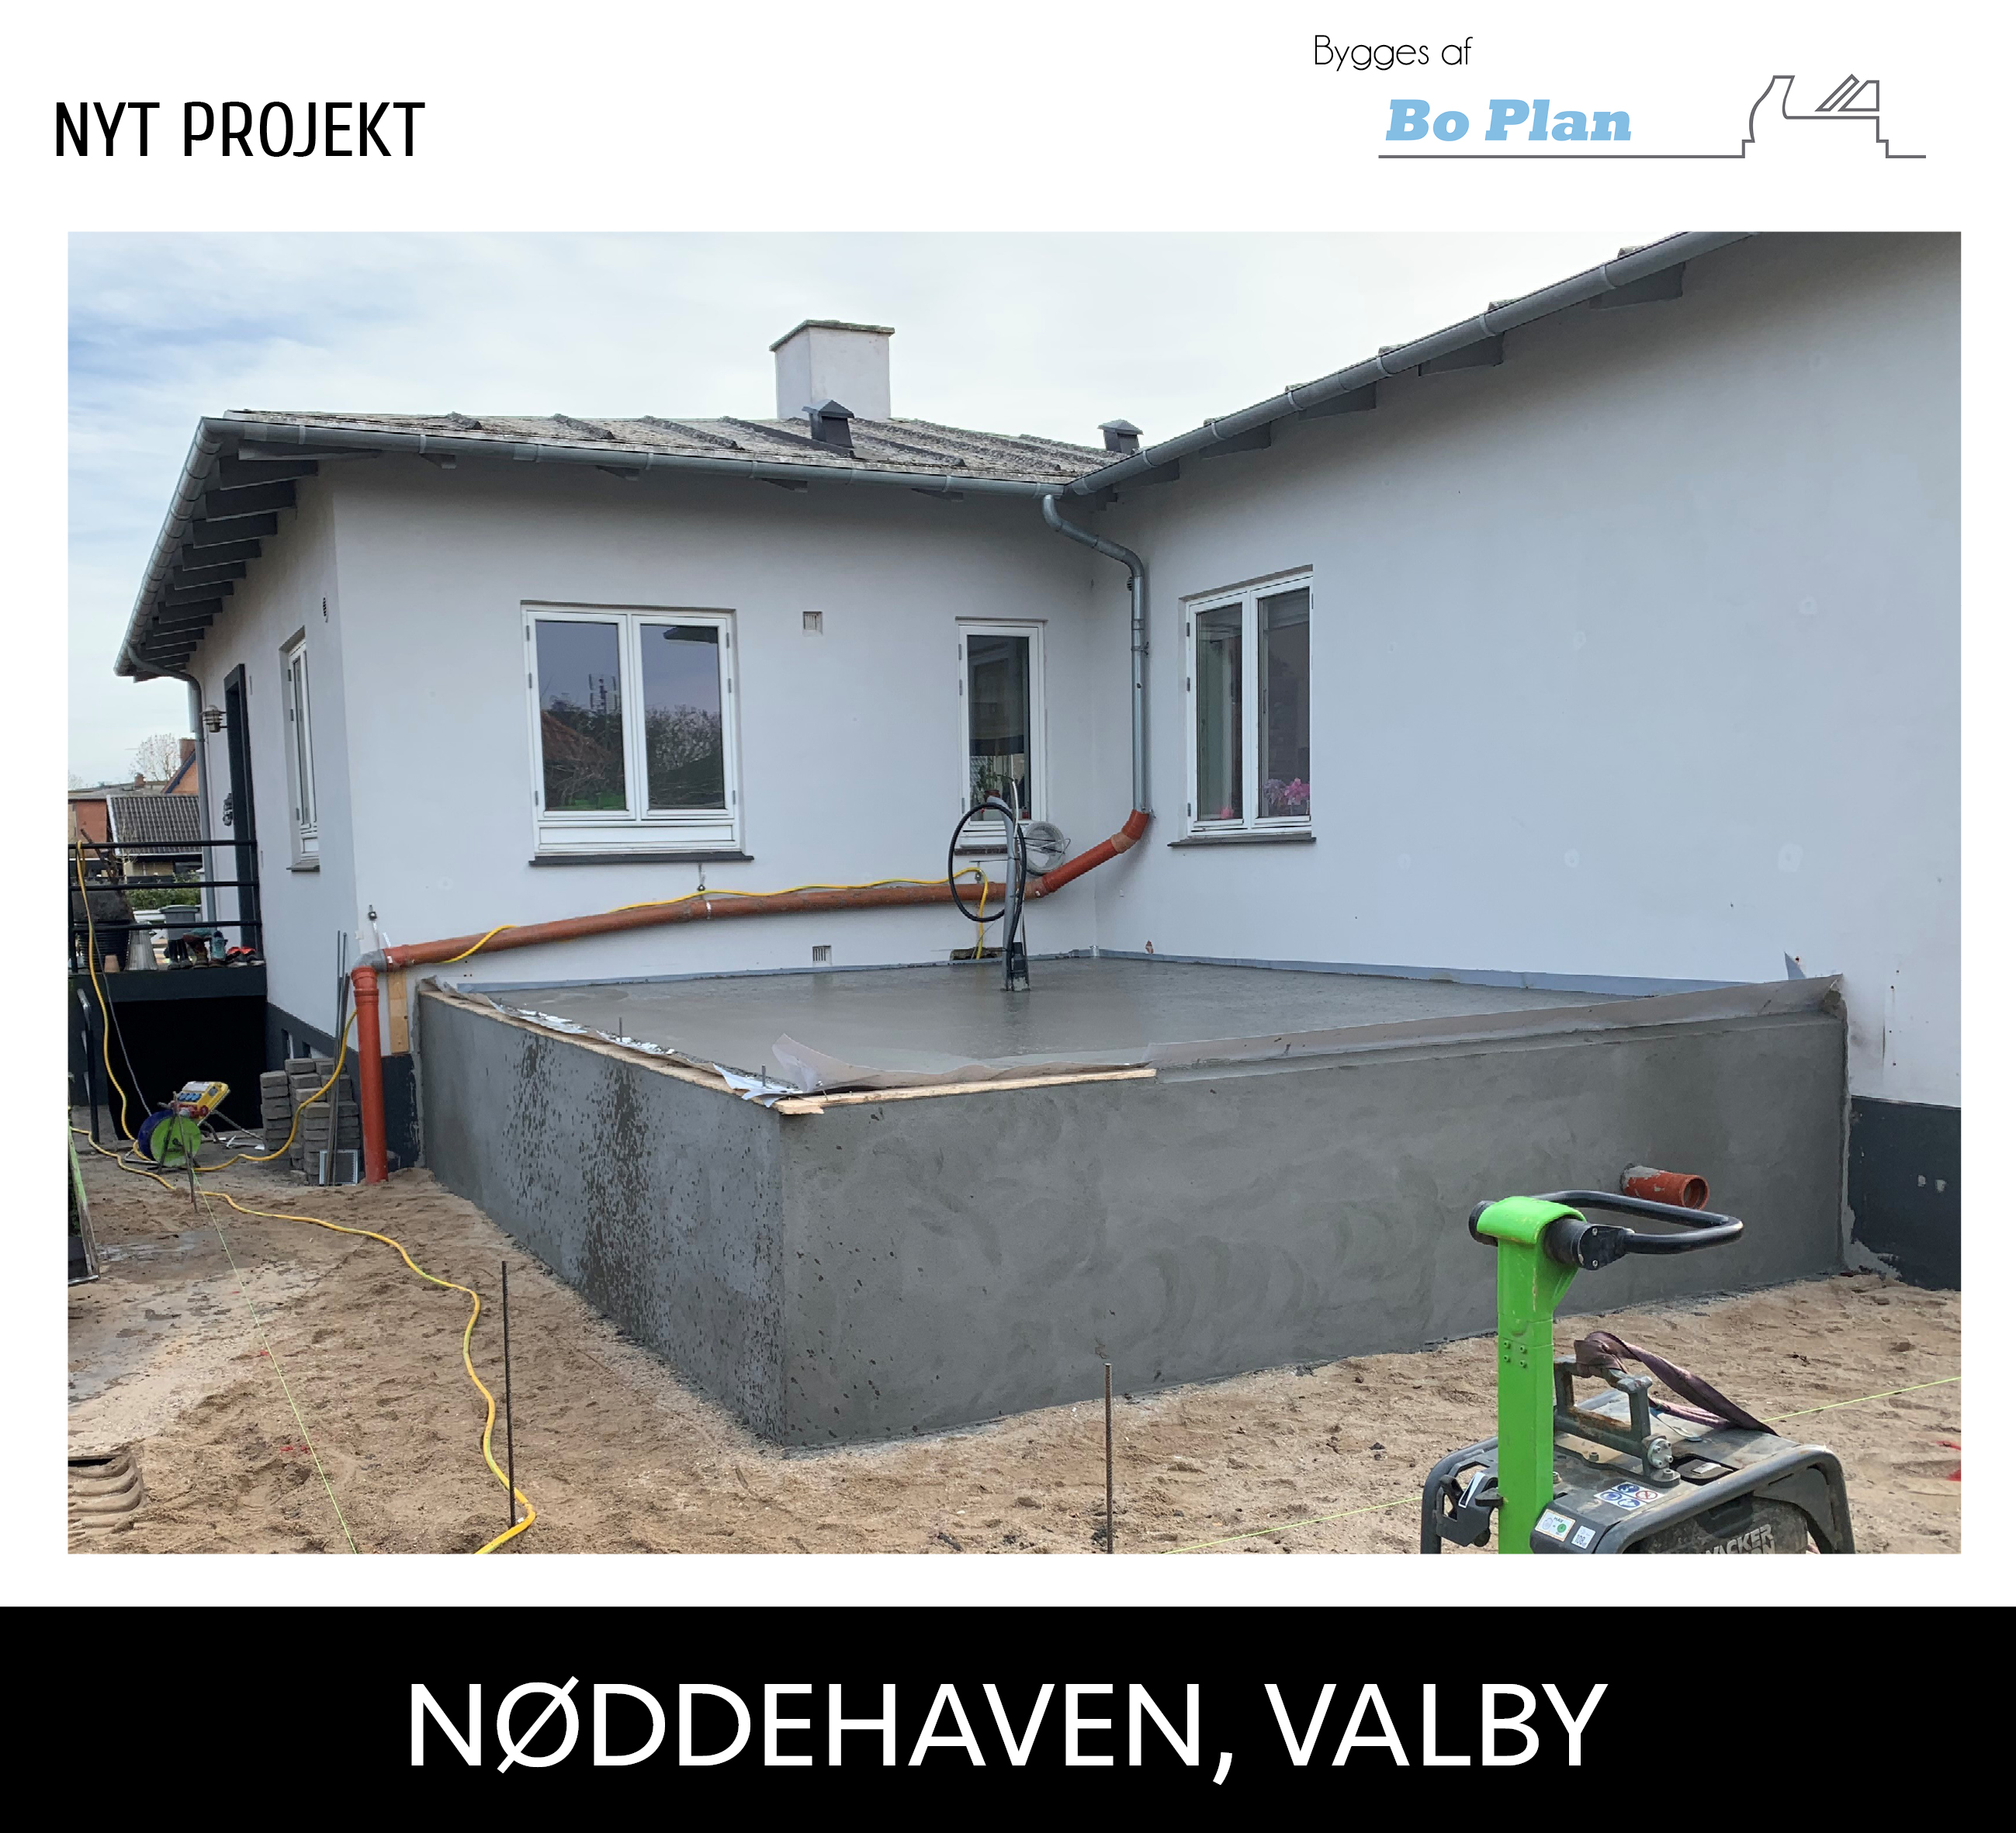 Nøddehaven, Valby9